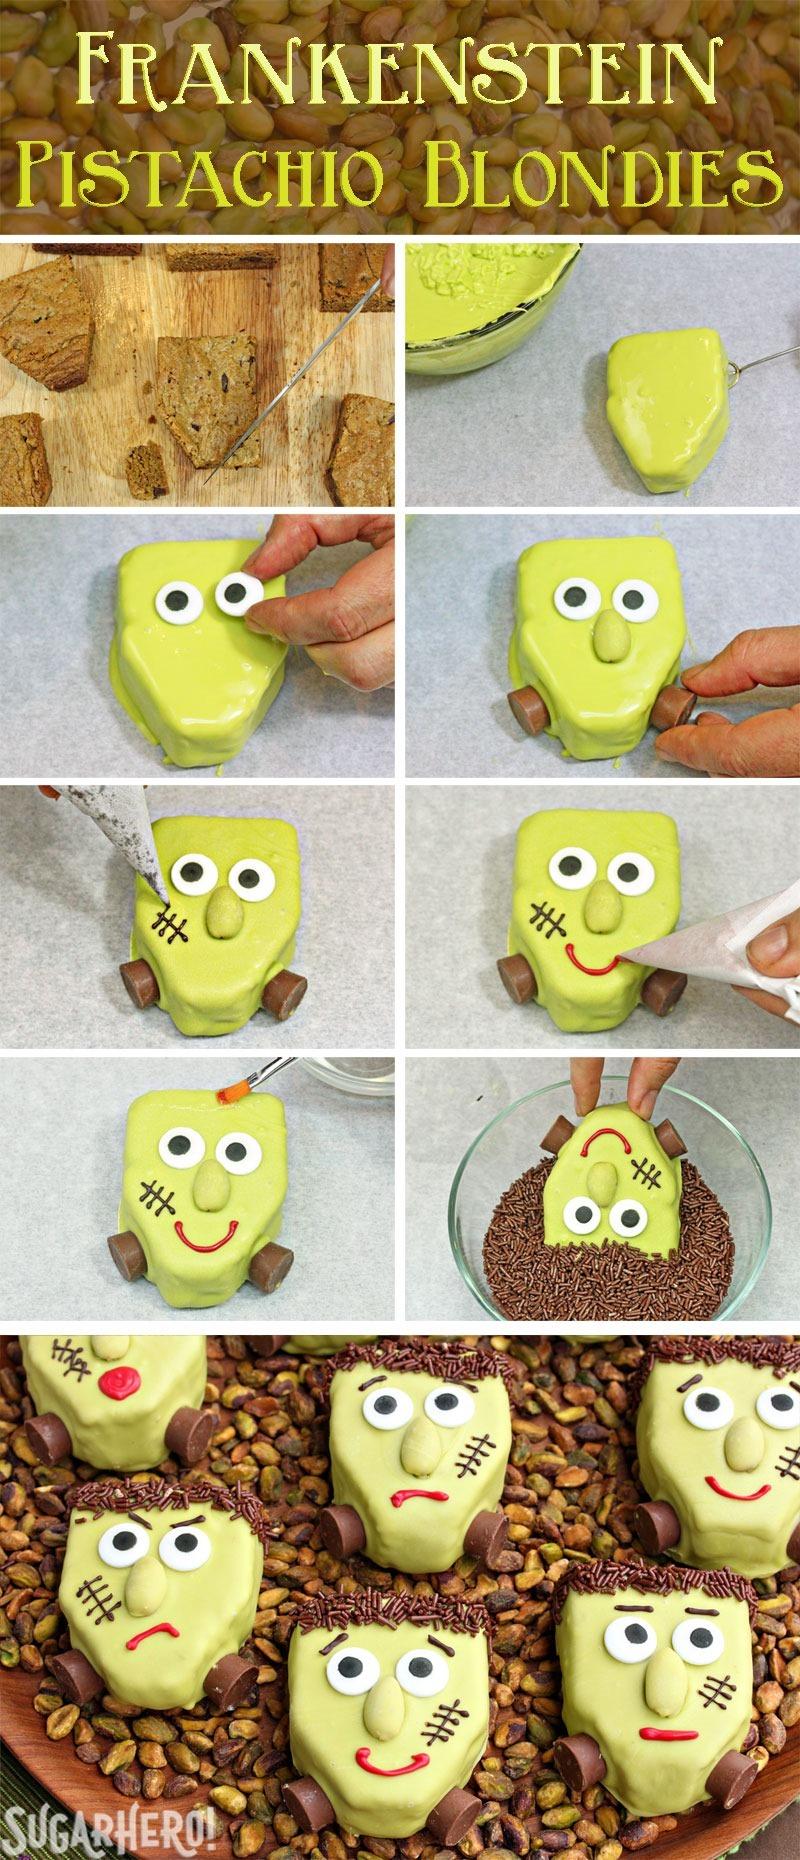 How to Make Frankenstein Pistachio Blondies | From SugarHero.com